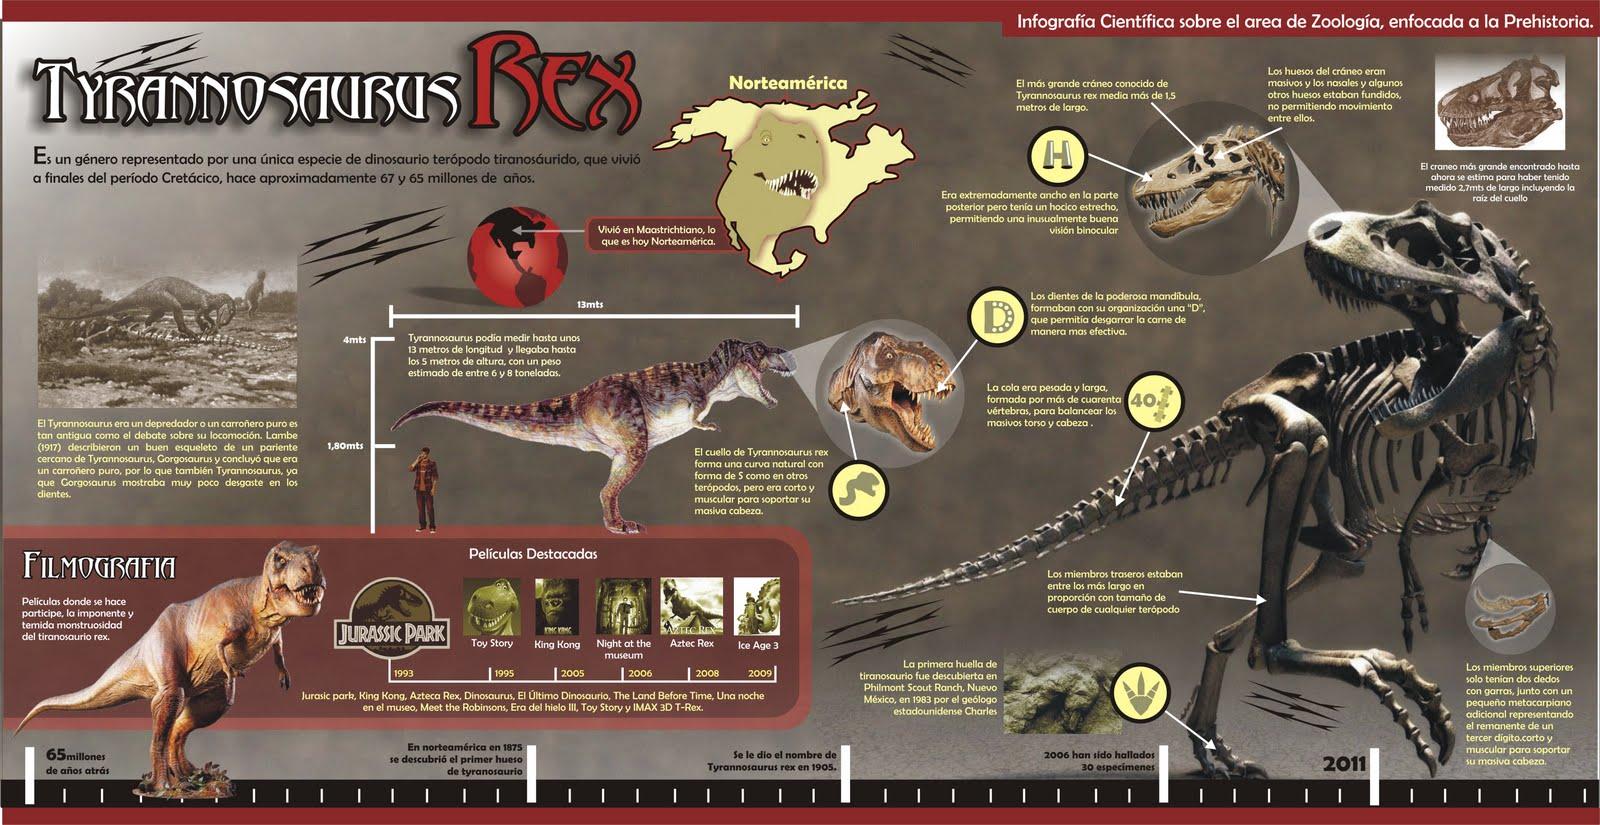 Tirannusaurus Rex